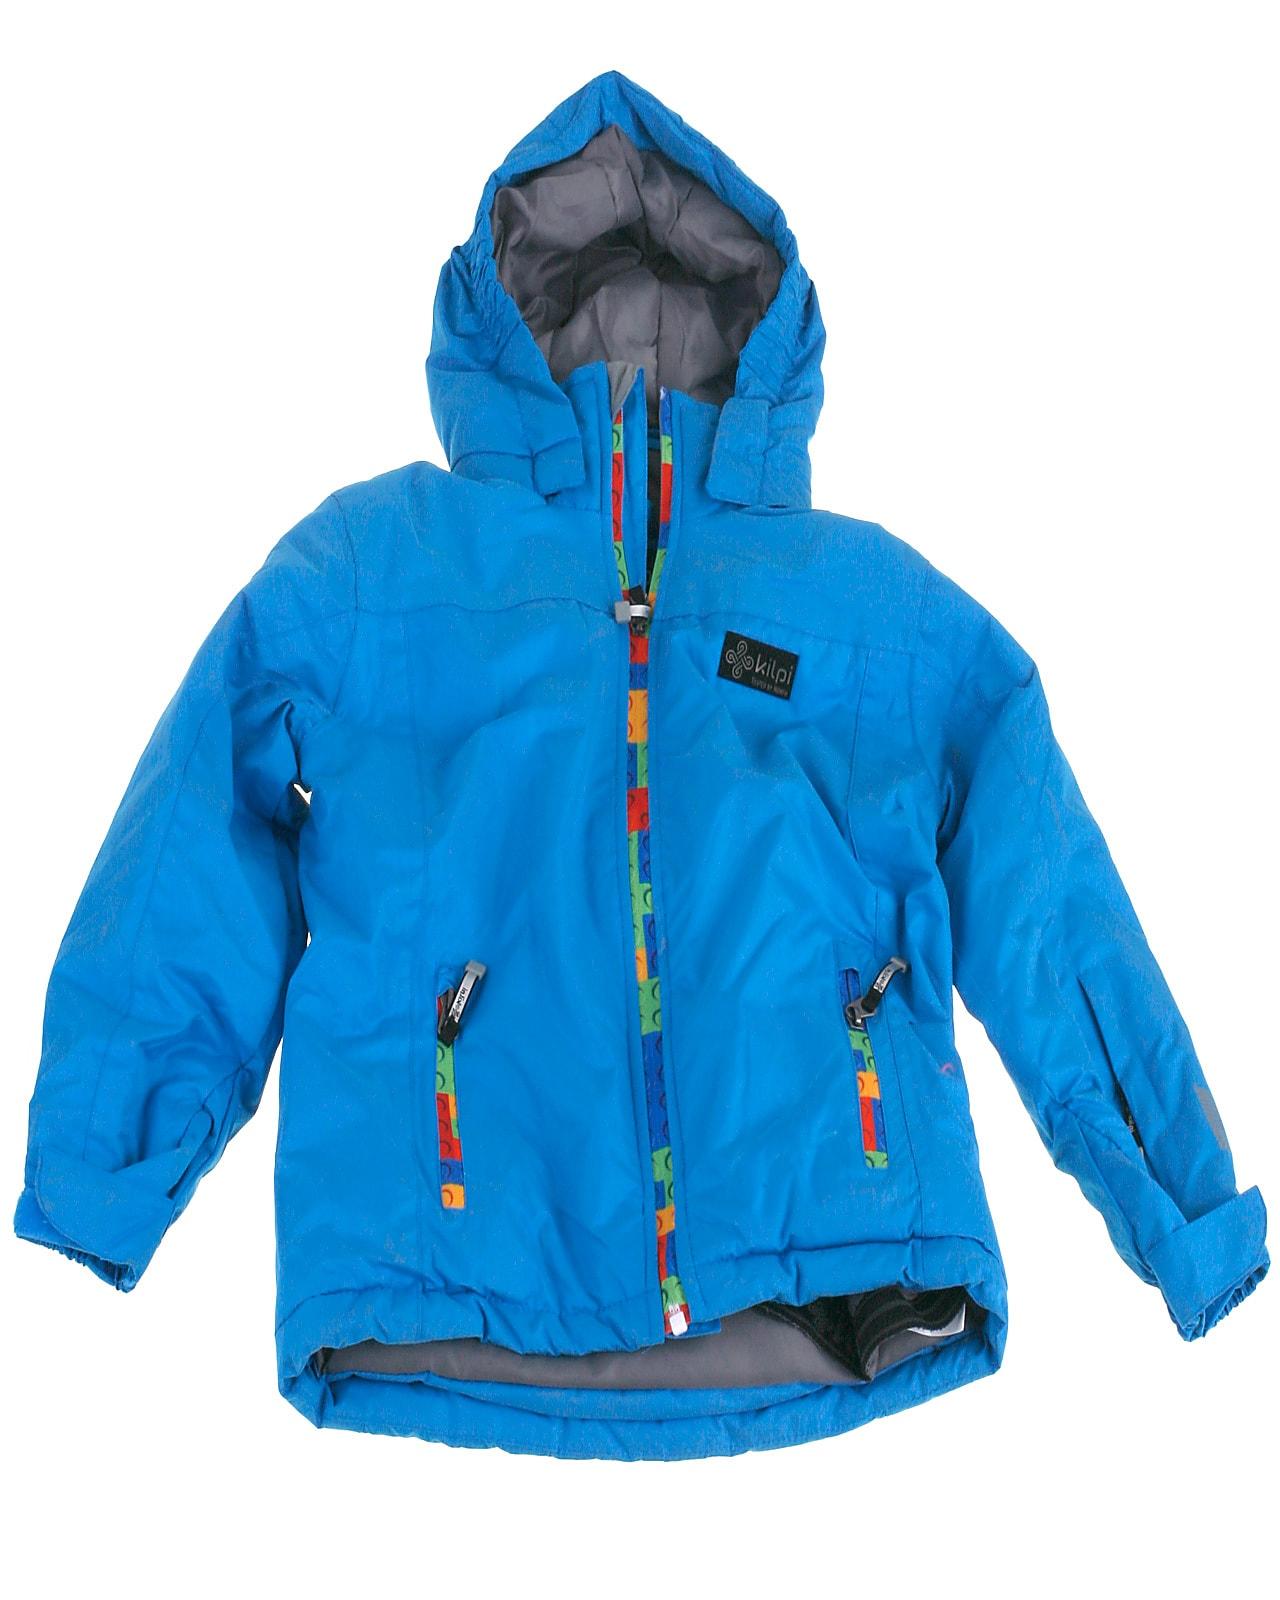 Kilpi skijakke, Ligas, blu